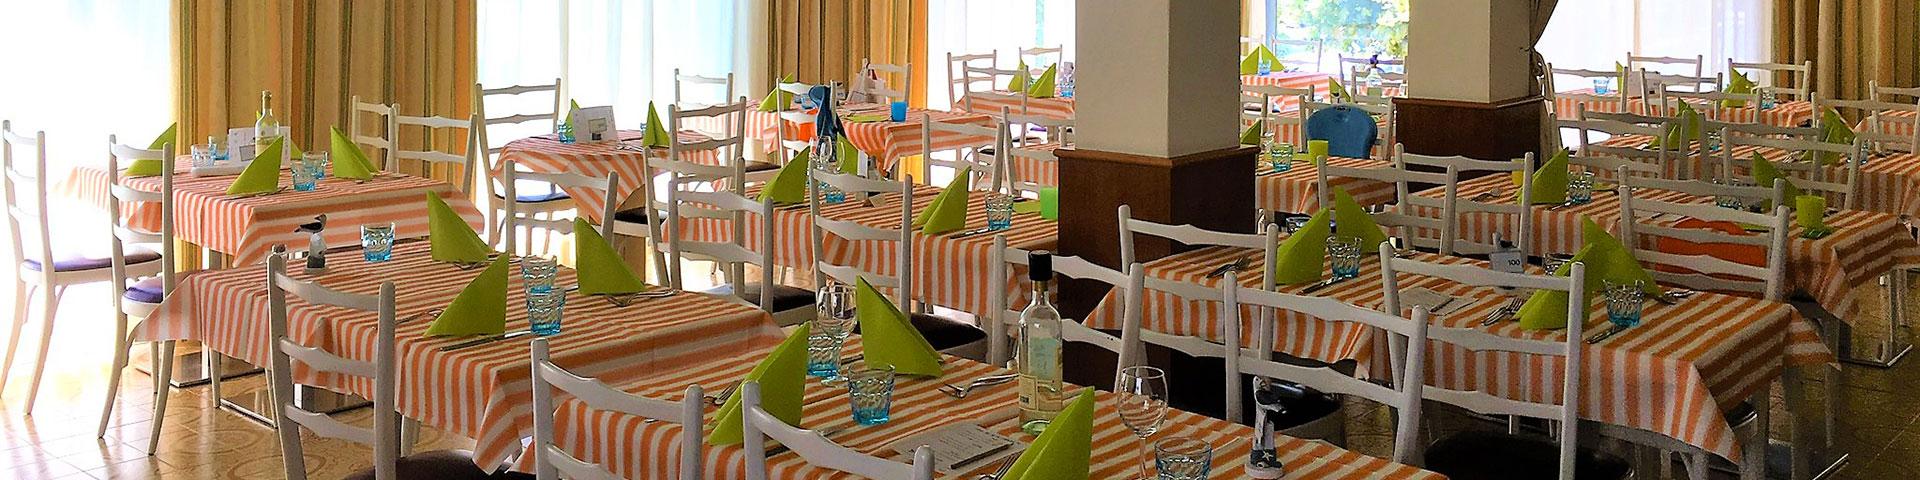 Cuisine | Hotel Daniel